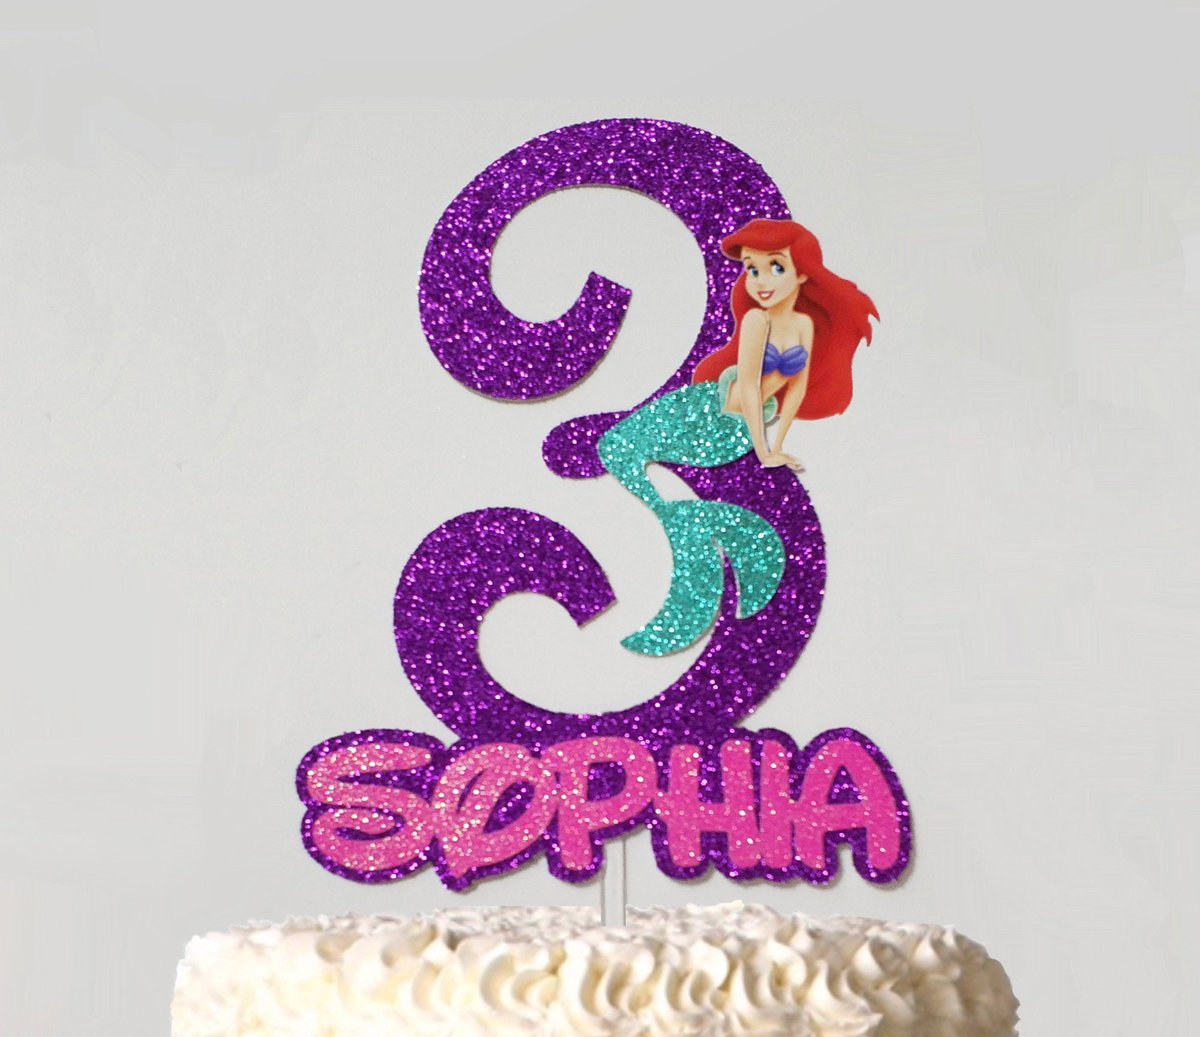 Incredible Jessica Truelove On Twitter Ariel Little Mermaid Cake Topper Funny Birthday Cards Online Drosicarndamsfinfo